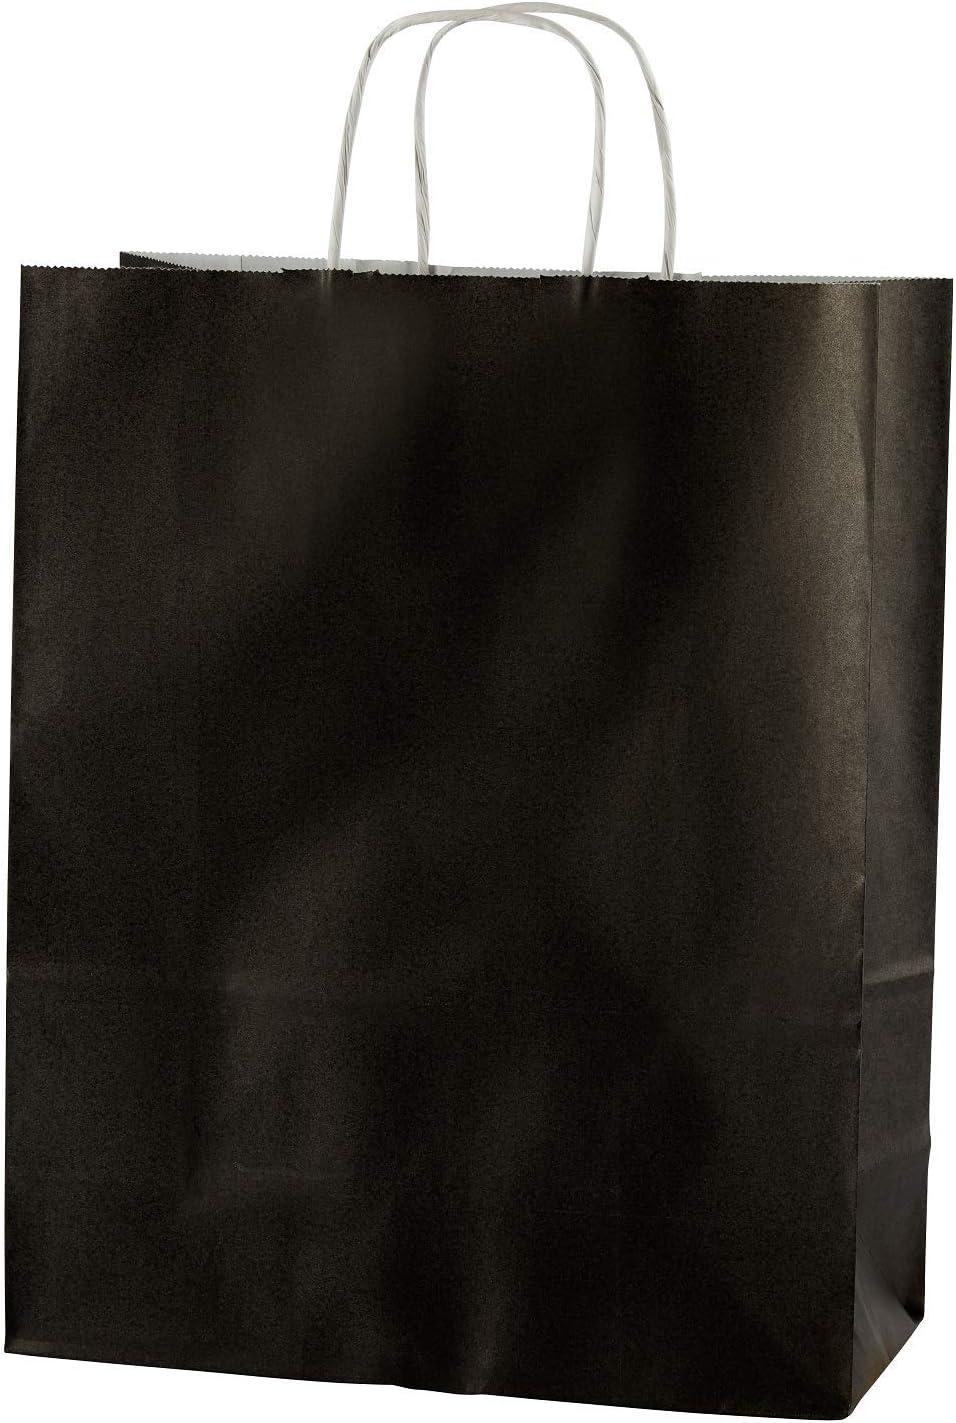 MEDIUM 250x110x310mm Thepaperbagstore 20 YELLOW TWIST HANDLE PAPER CARRIER BAGS